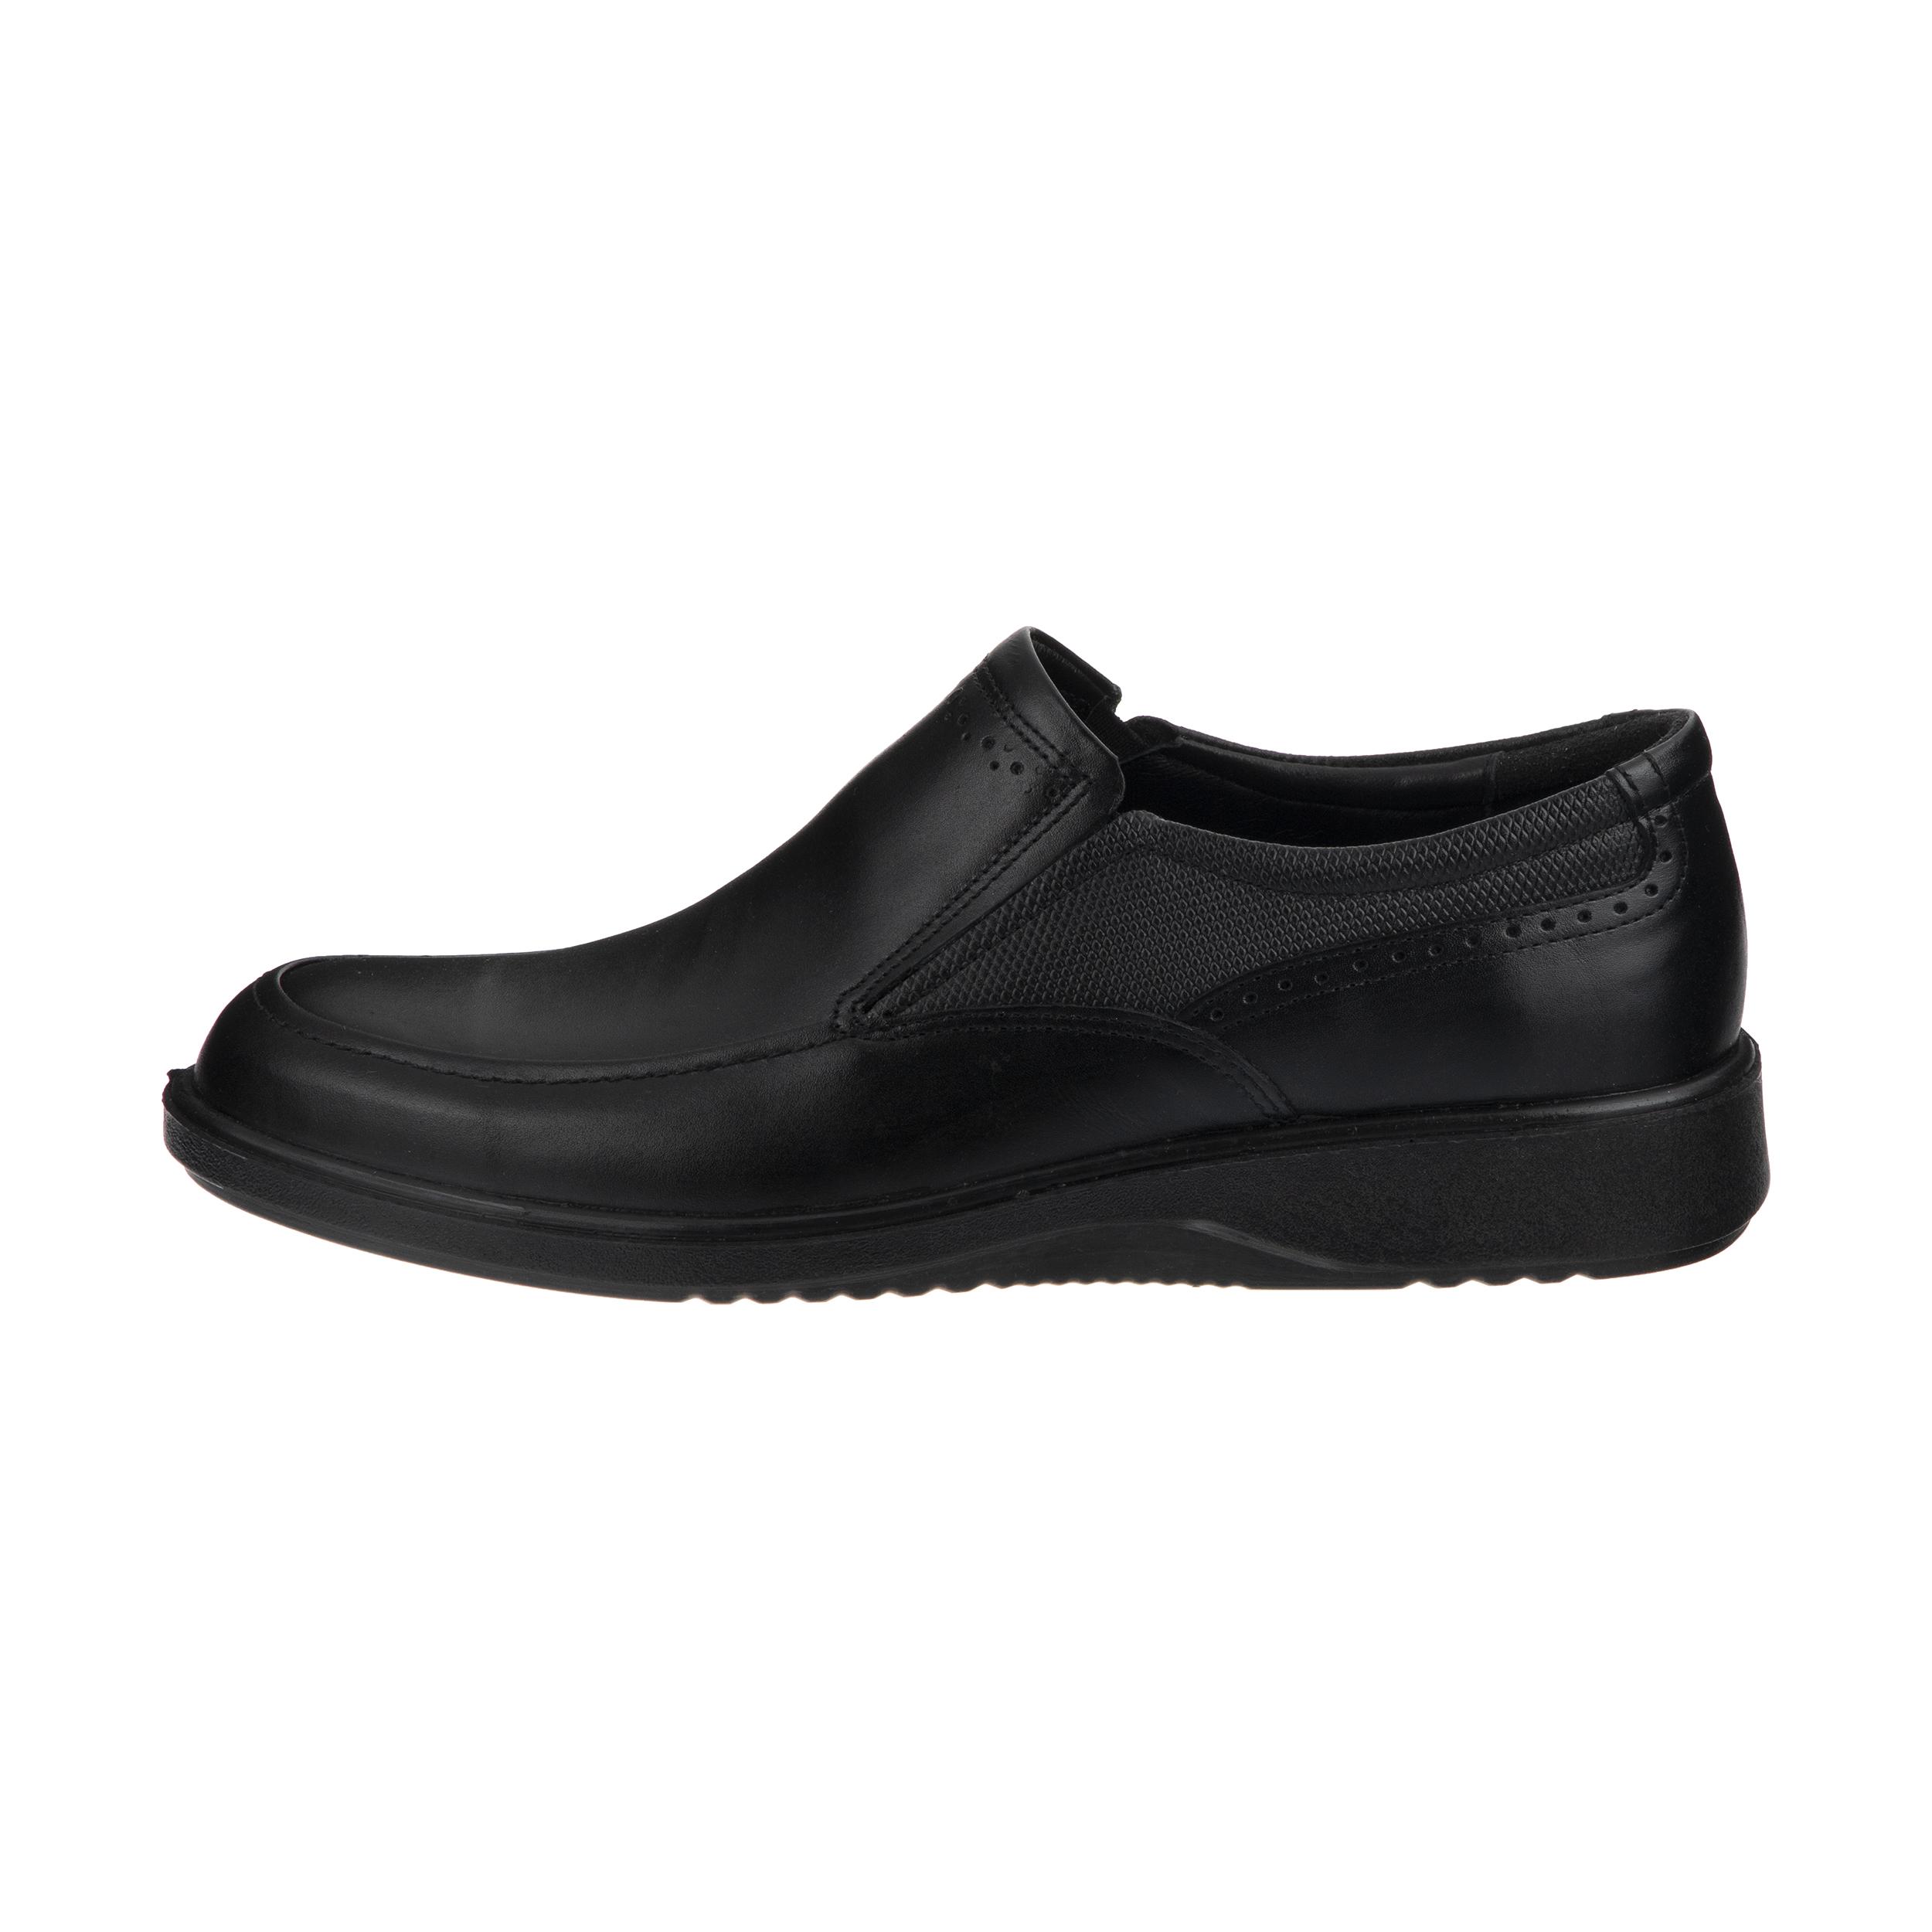 کفش روزمره مردانه بلوط مدل 7227G503101